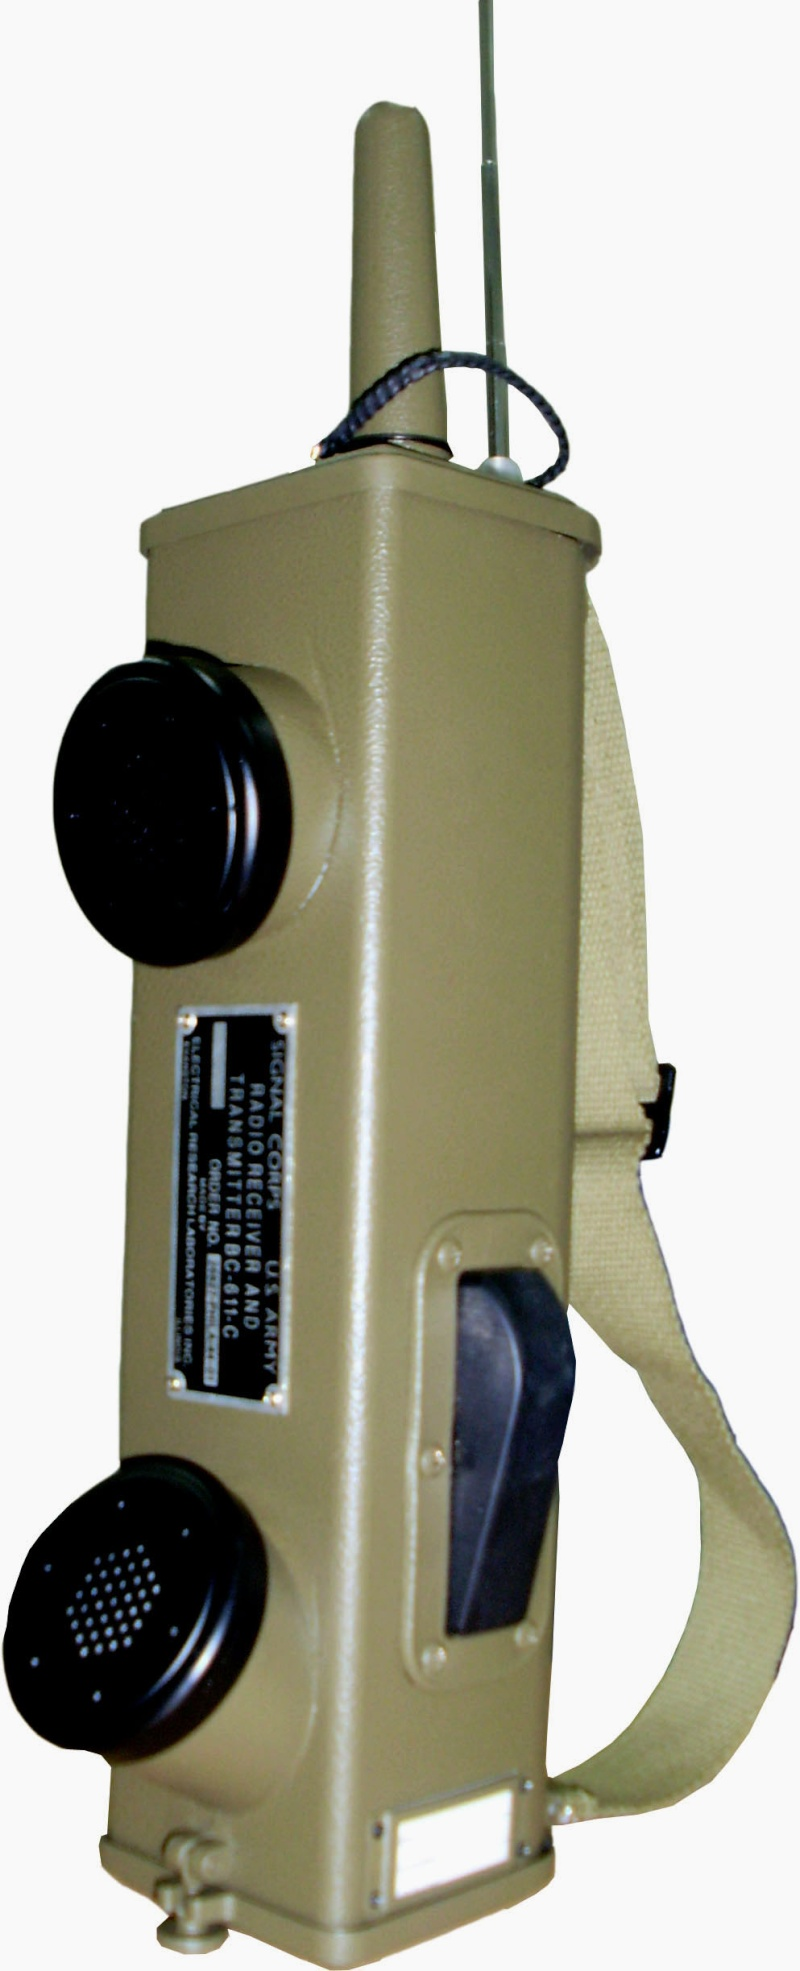 WPG stocking fully functional REPRO Handie Talkies Bc-61111